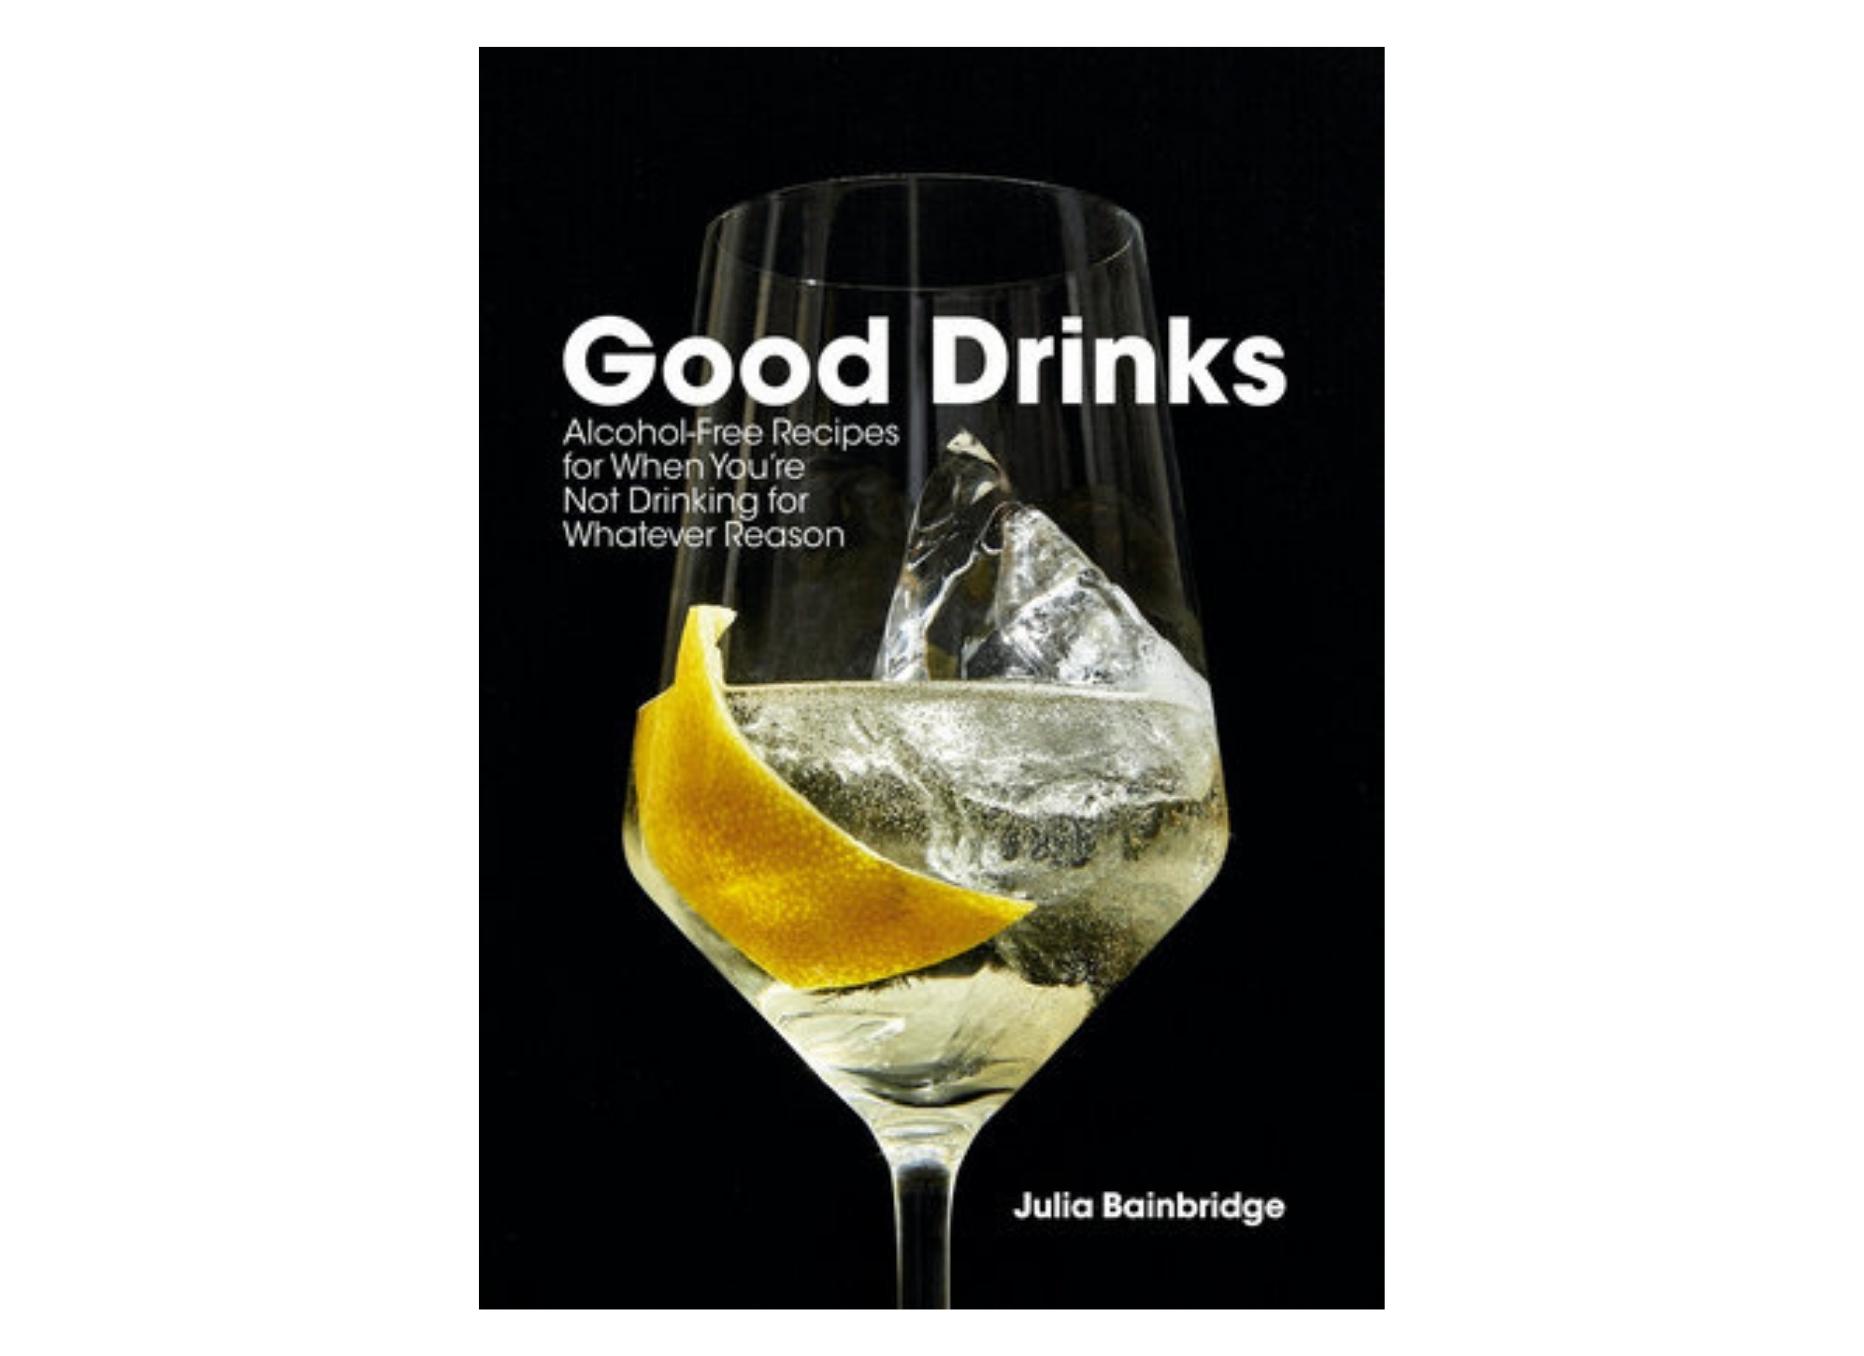 Good Drinks Recipe Book